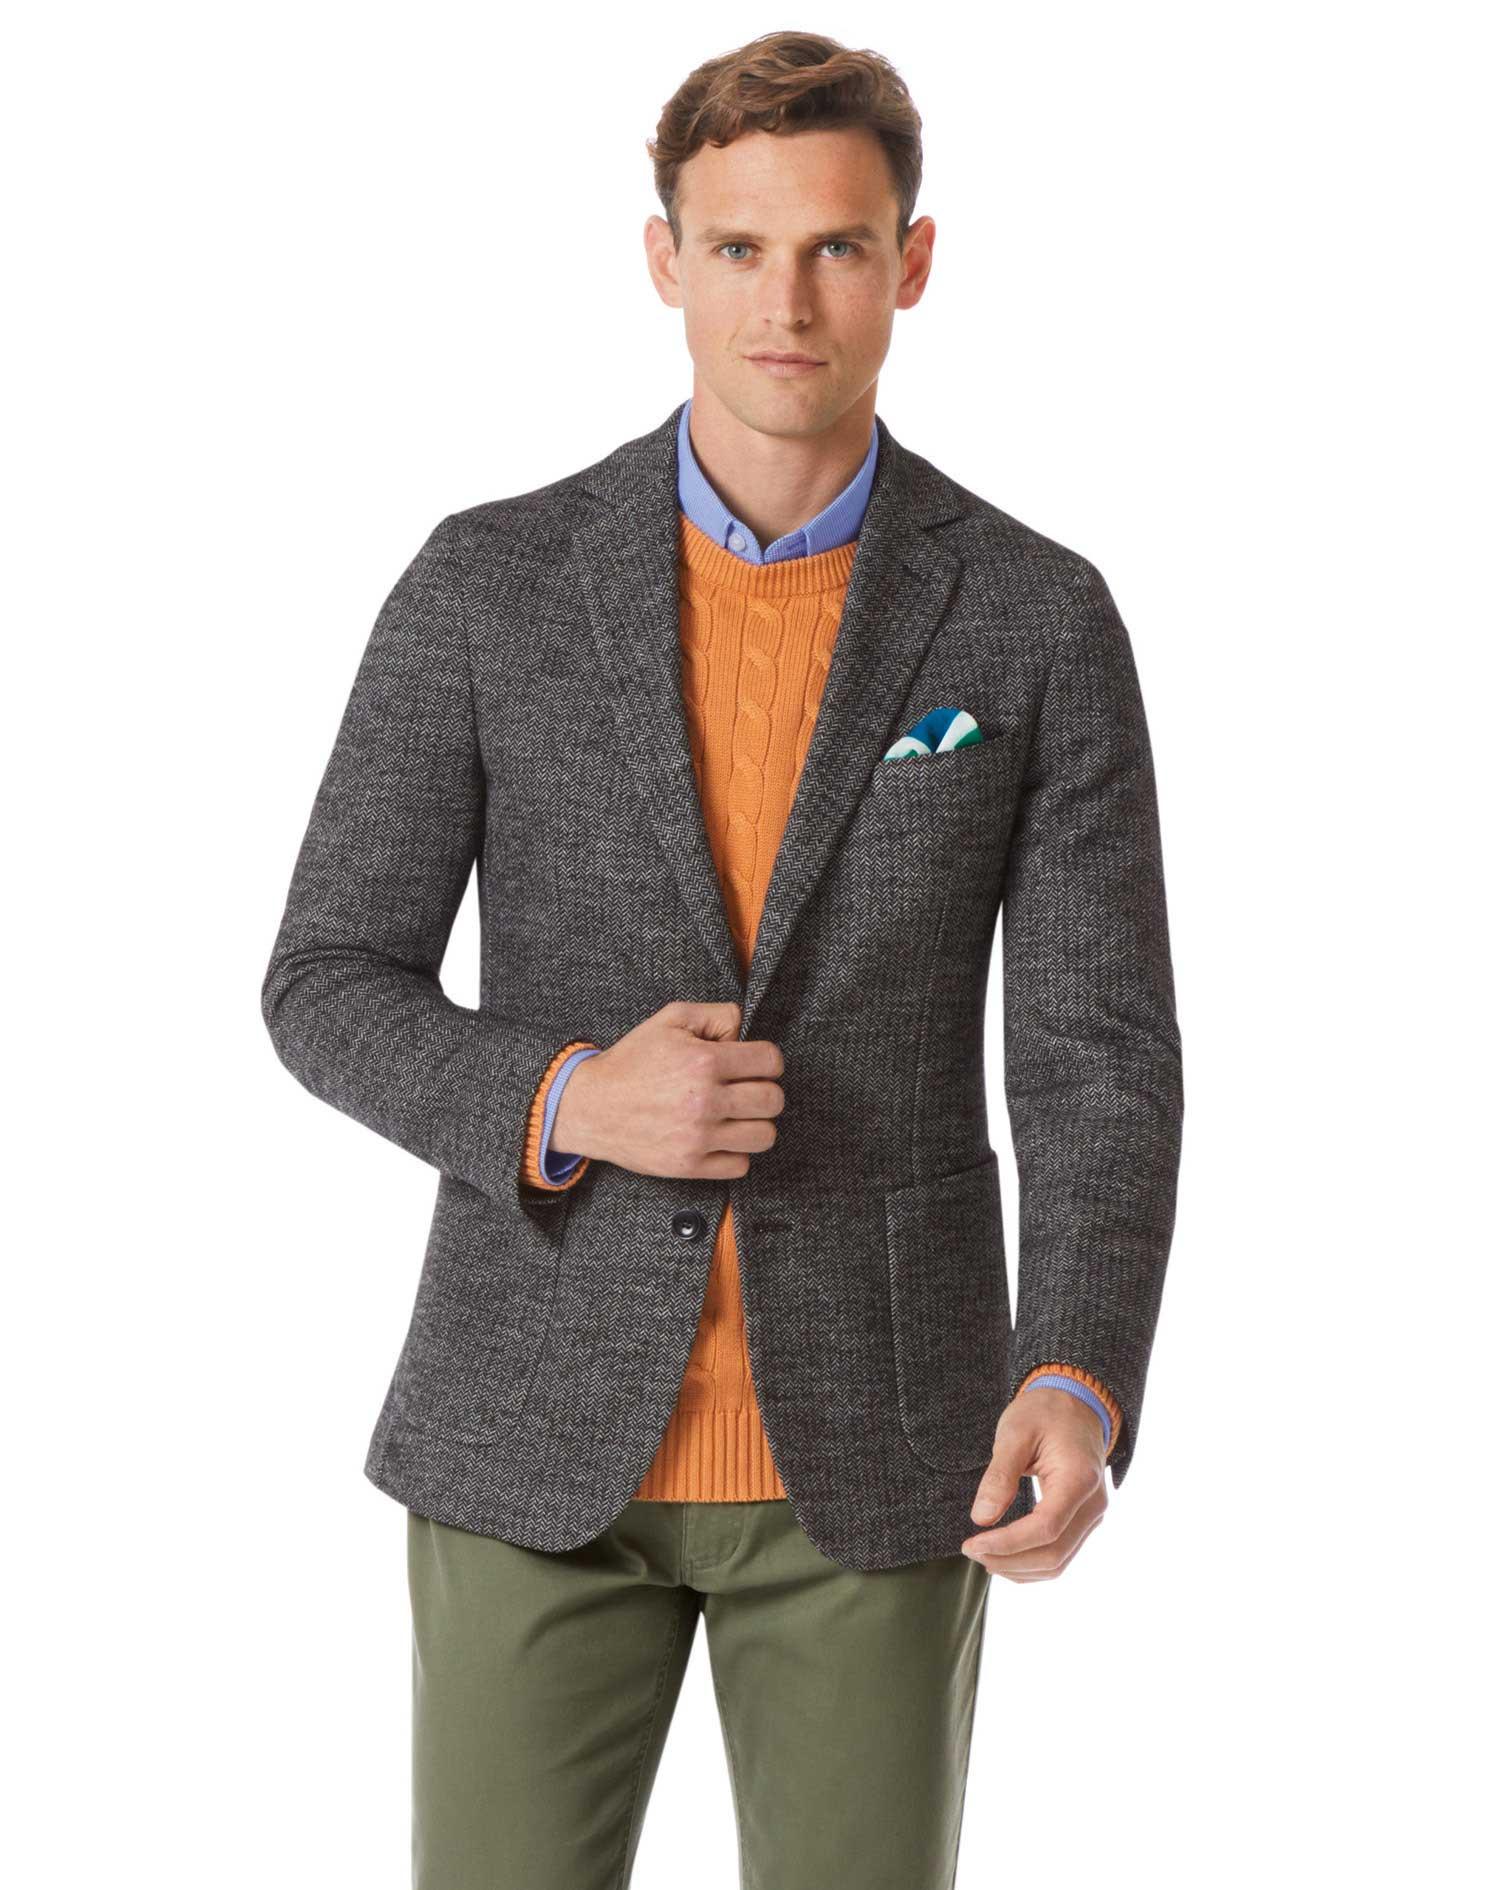 Slim Fit Black and White Stretch Wool Jacket Size 38 Regular by Charles Tyrwhitt